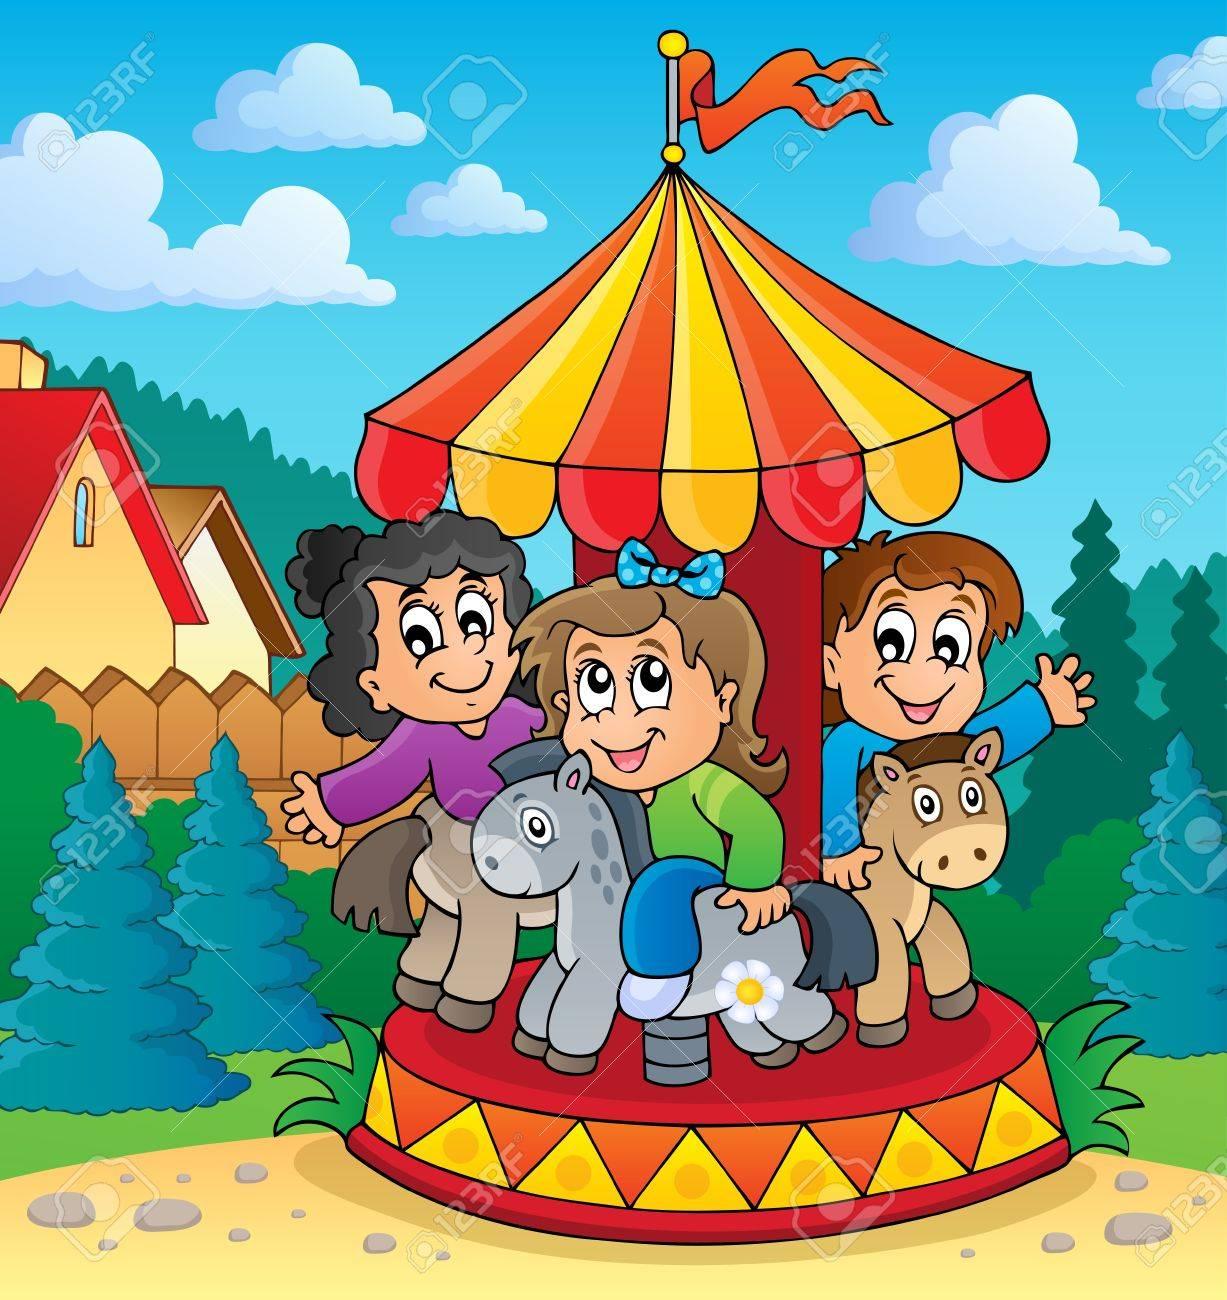 Carousel theme image 2 - eps10 vector illustration Stock Vector - 22867092